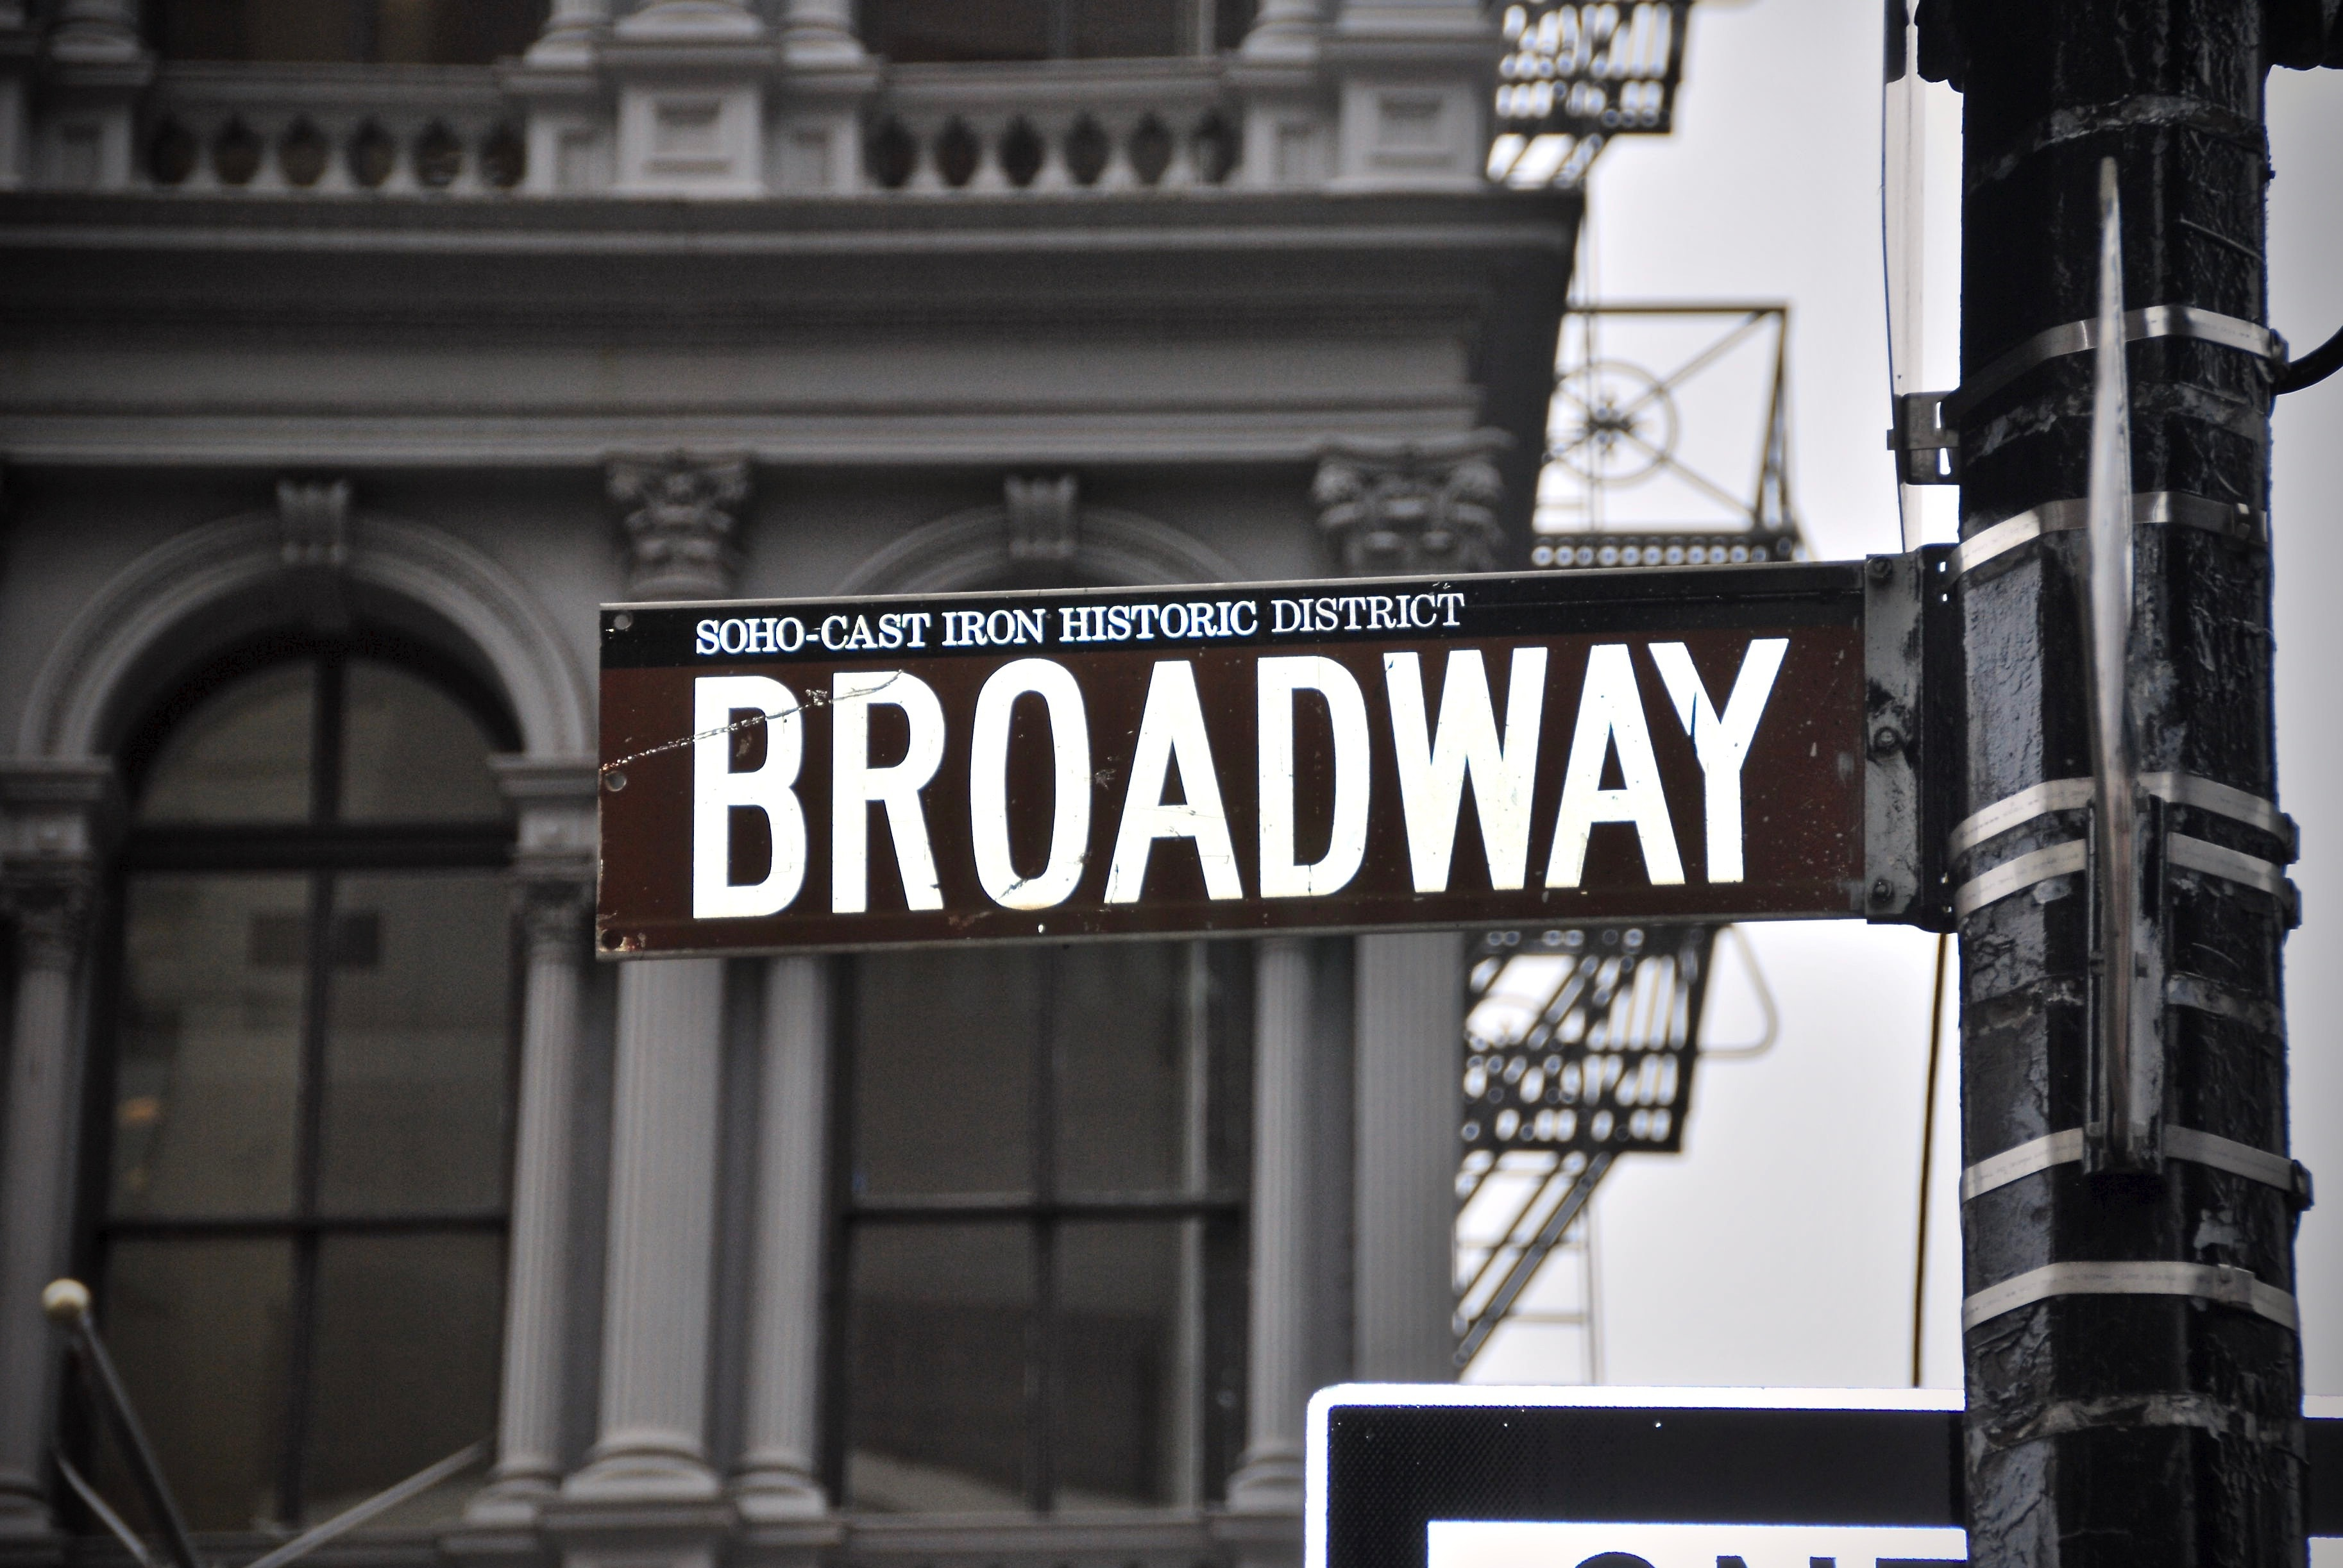 Broadway signboard